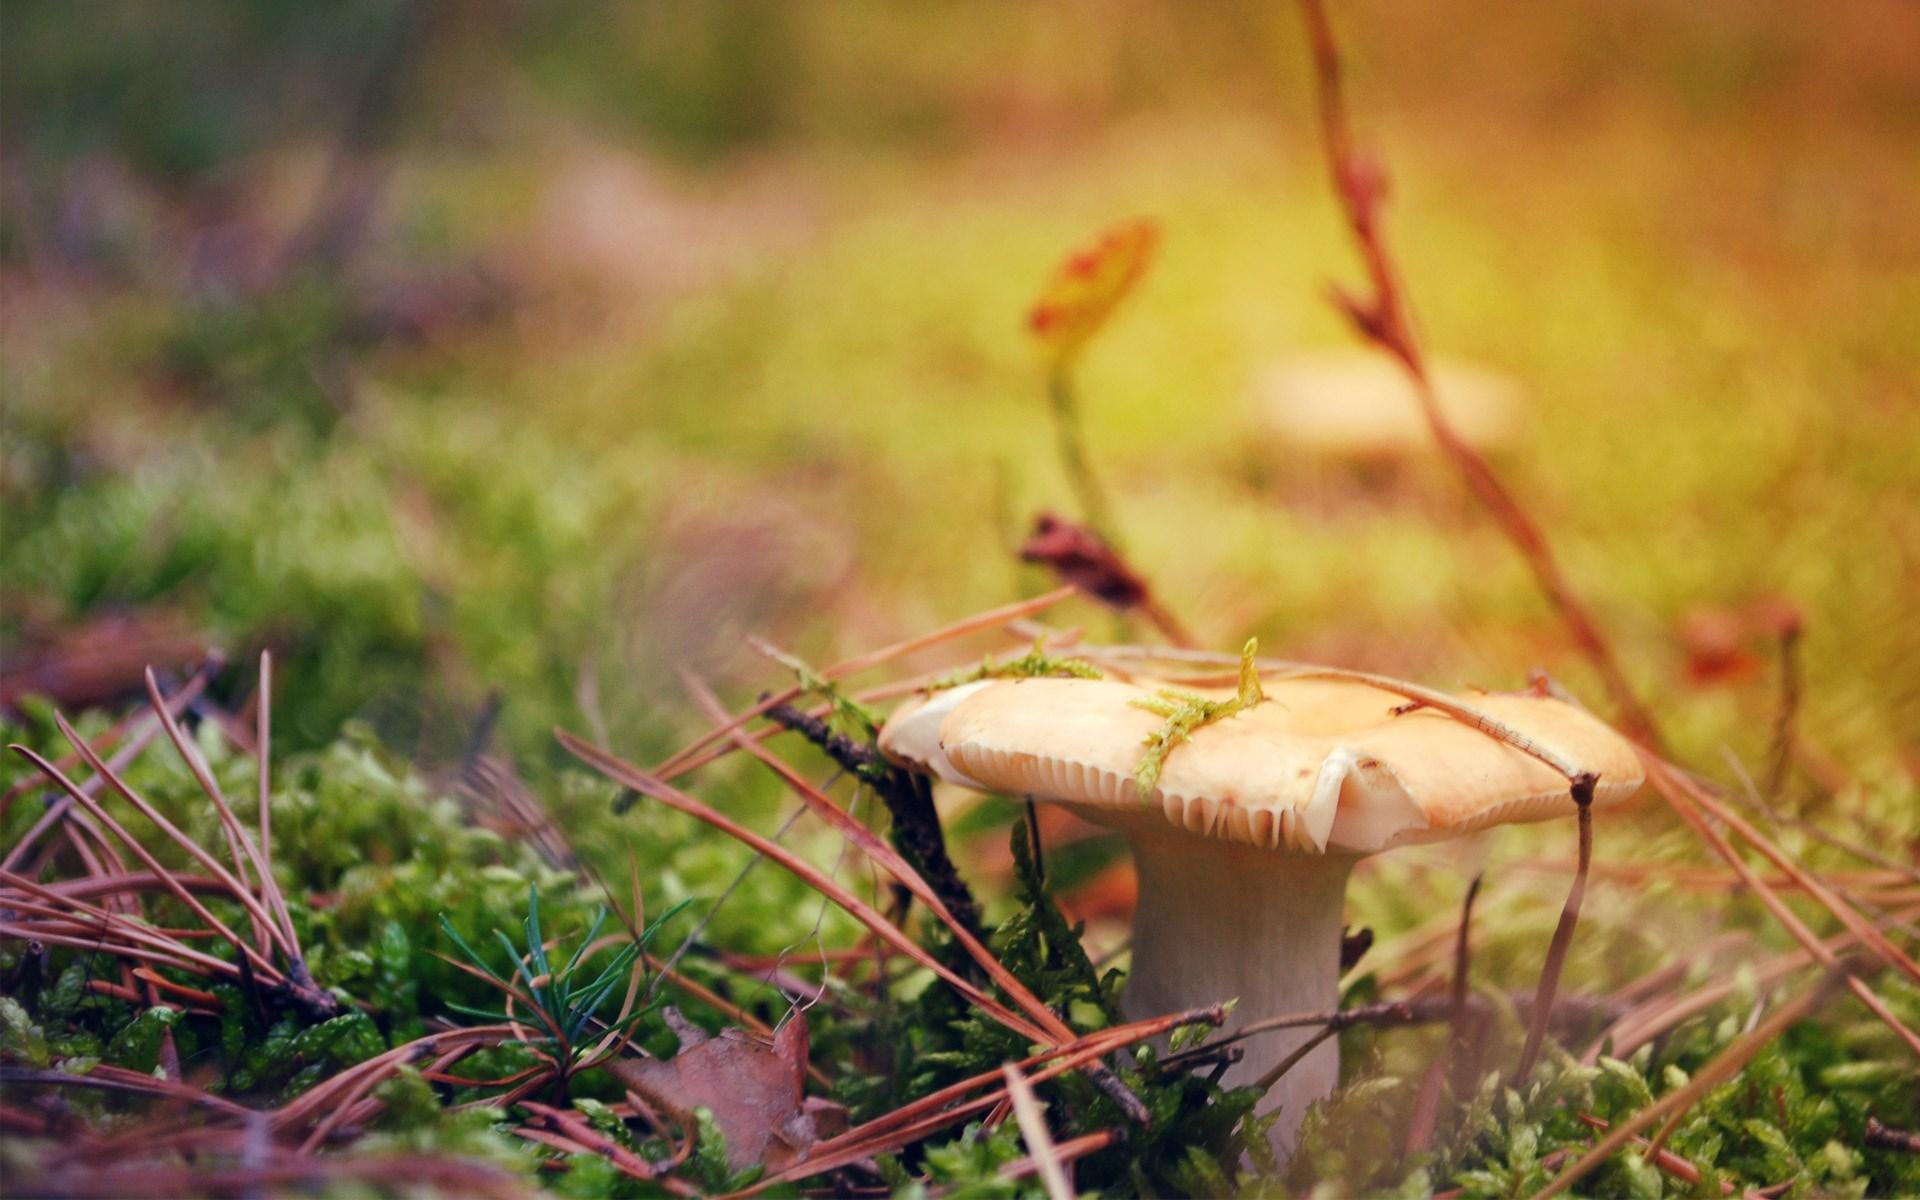 Fungus Macro Autumn Leaves Needles Nature